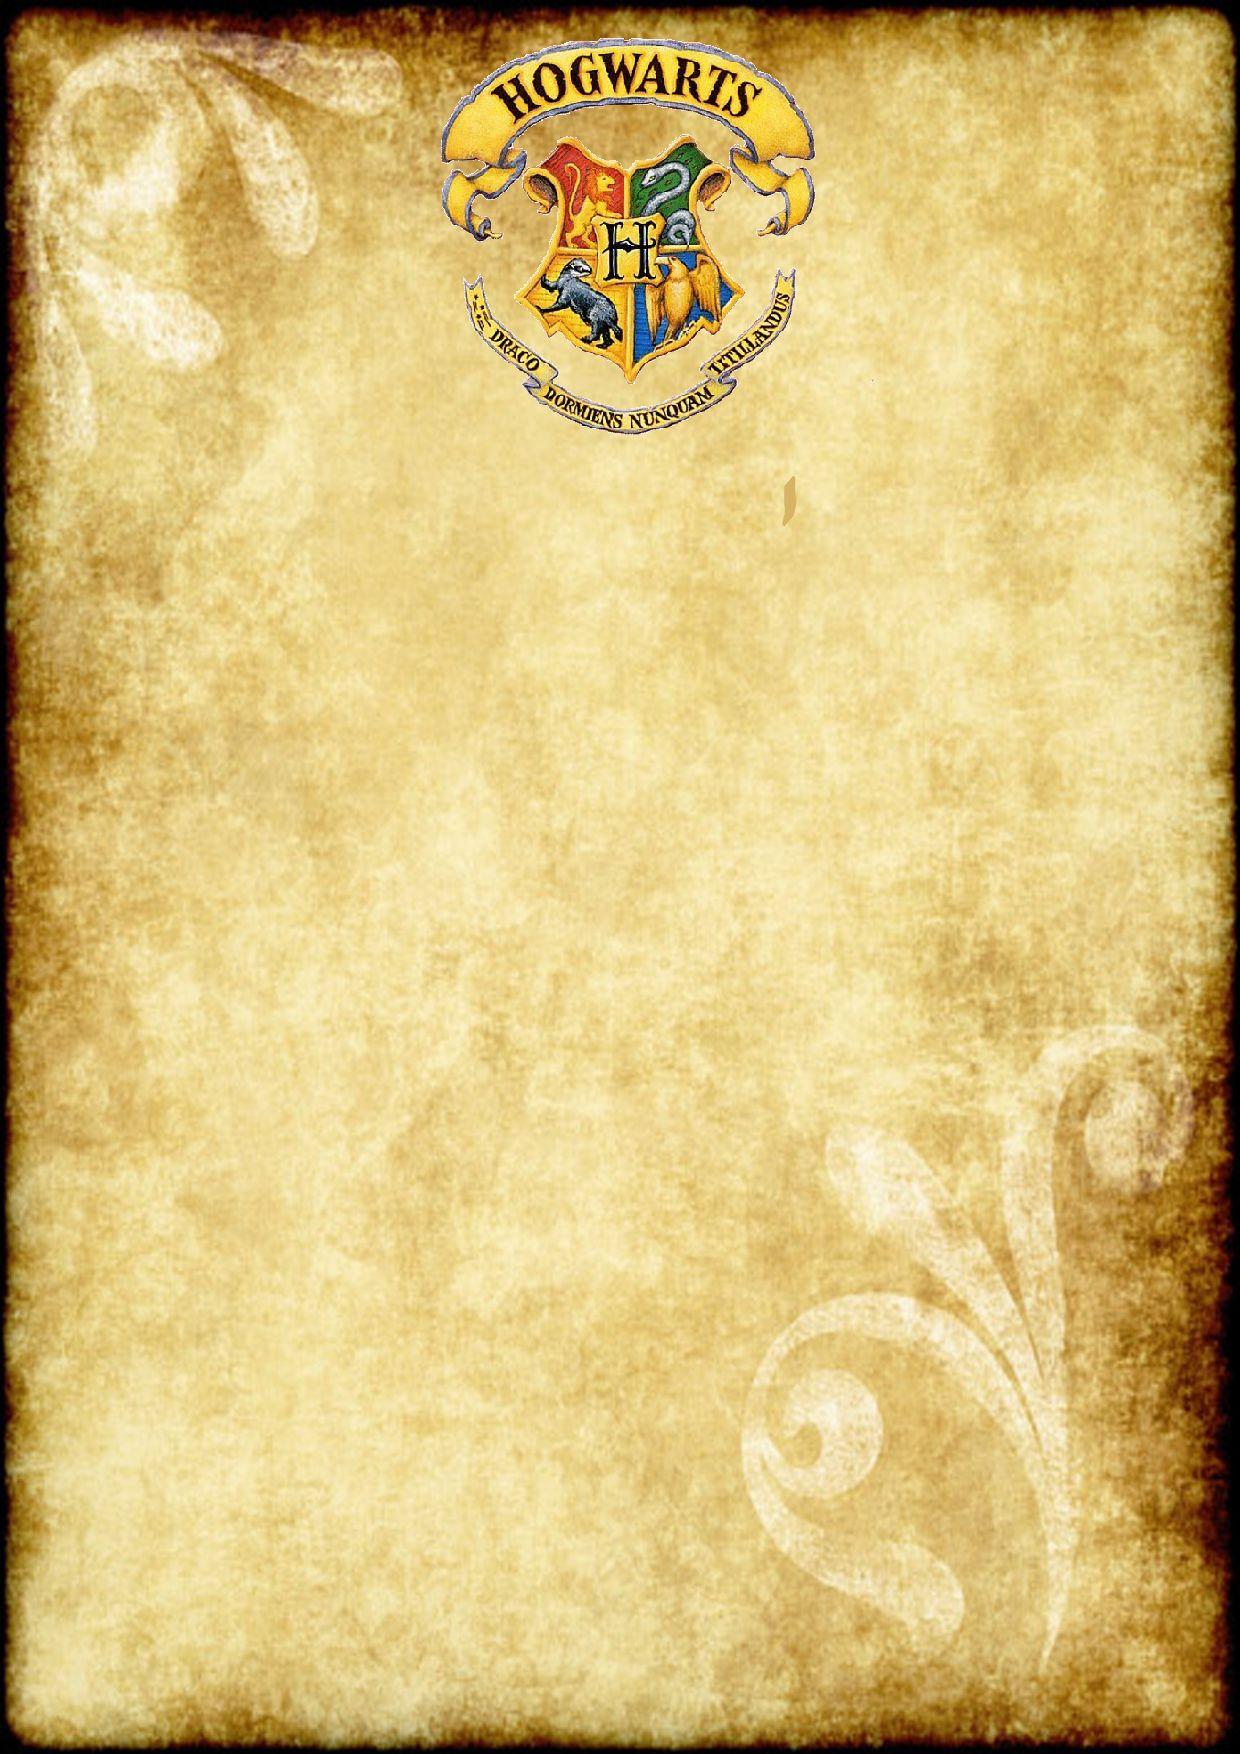 Free Printable Harry Potter Party Blank Parchment A4 Size Nj Pinterest Harry Potter